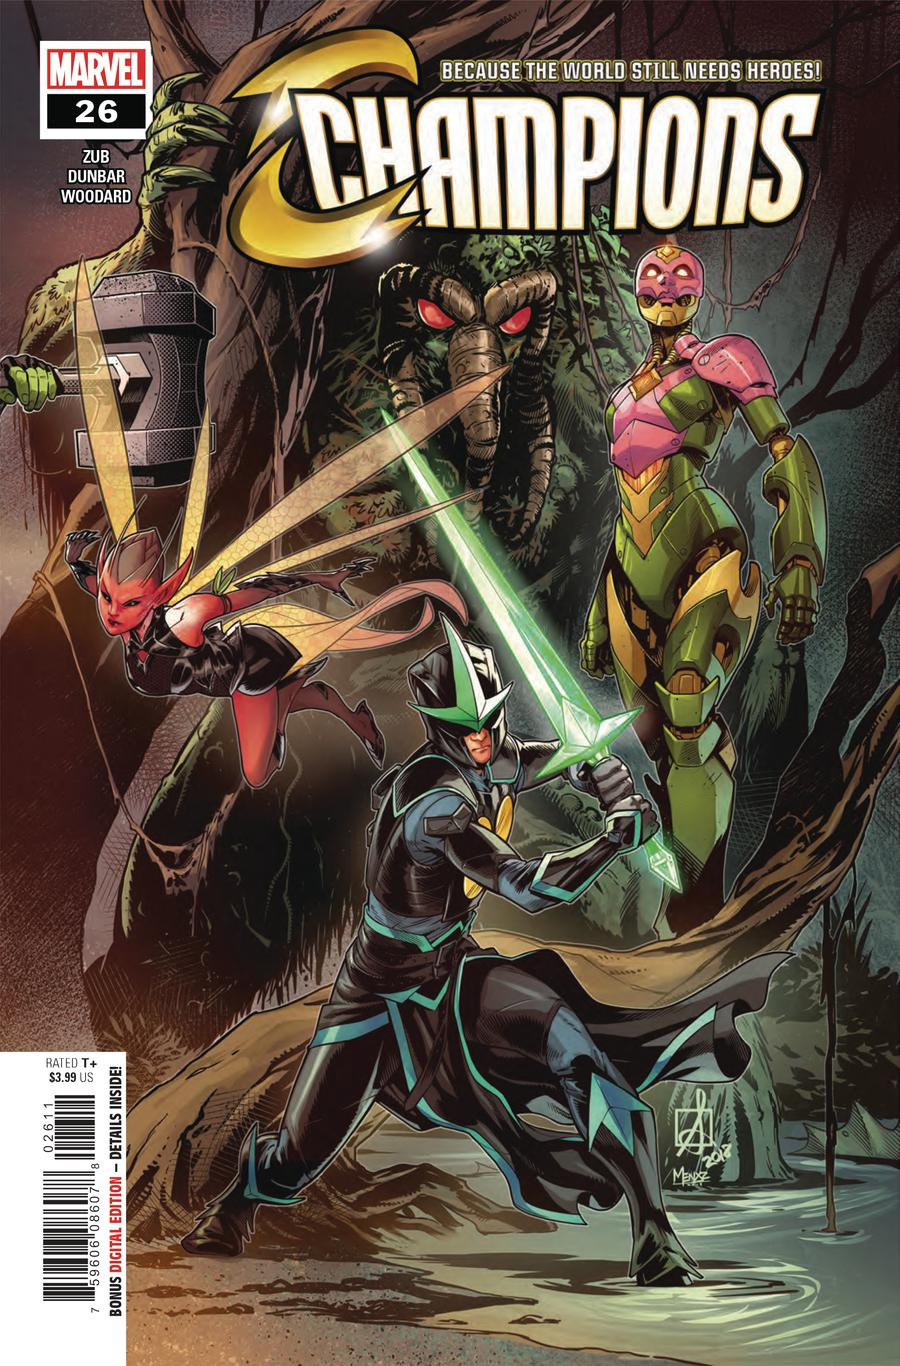 Champions (Marvel) Vol 2 #26 Cover A Regular Sean Izaakse Cover